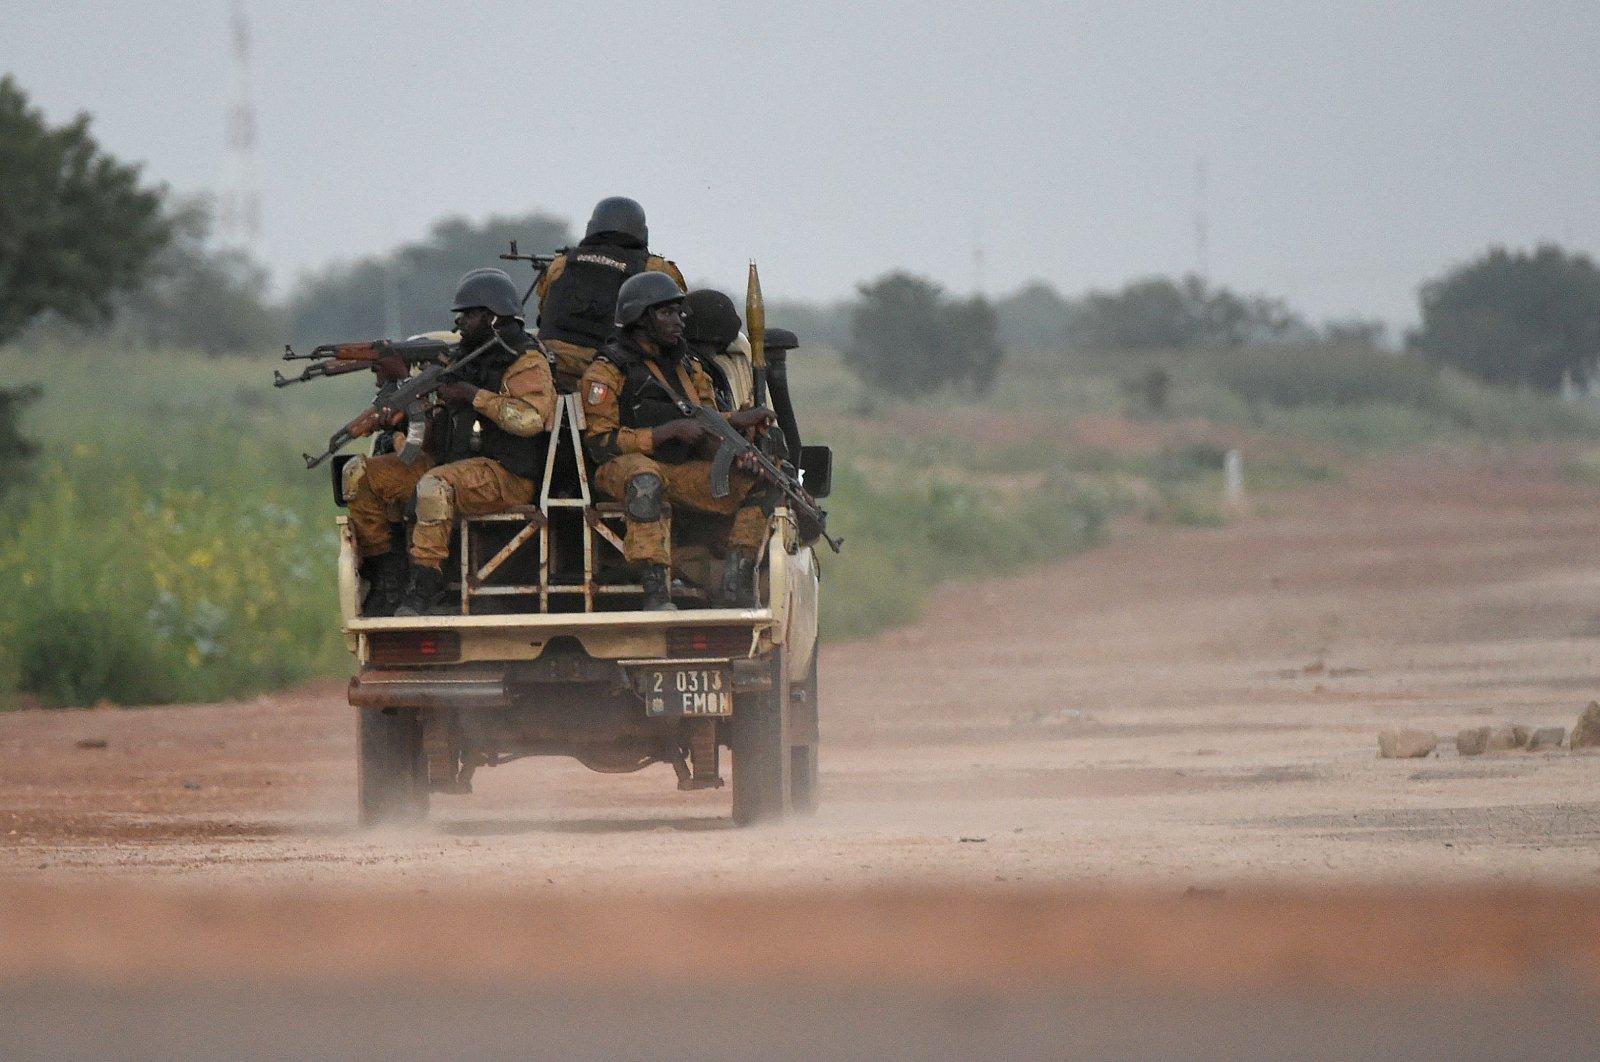 Burkinabe gendarmes patrol near the Presidential Security Regiment (RSP) military barracks in Ouagadougou, Burkina Faso, Sept. 29, 2015. (AFP Photo)